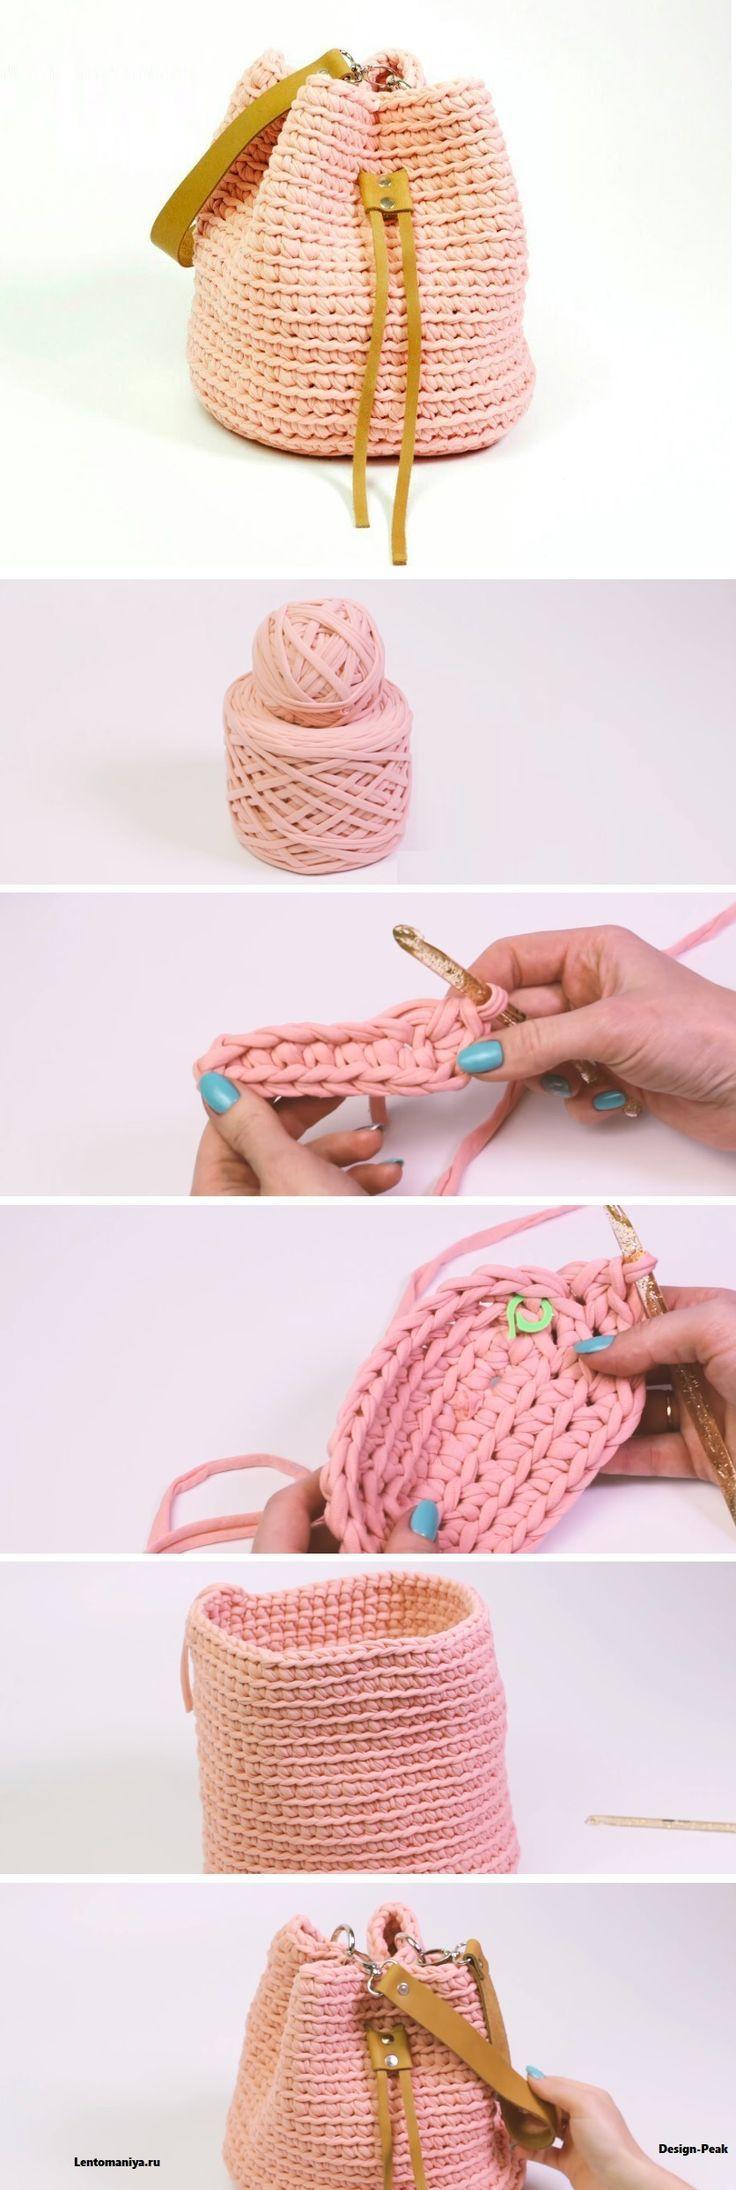 503 best Häkeln images on Pinterest | Knit crochet, Crocheting ...